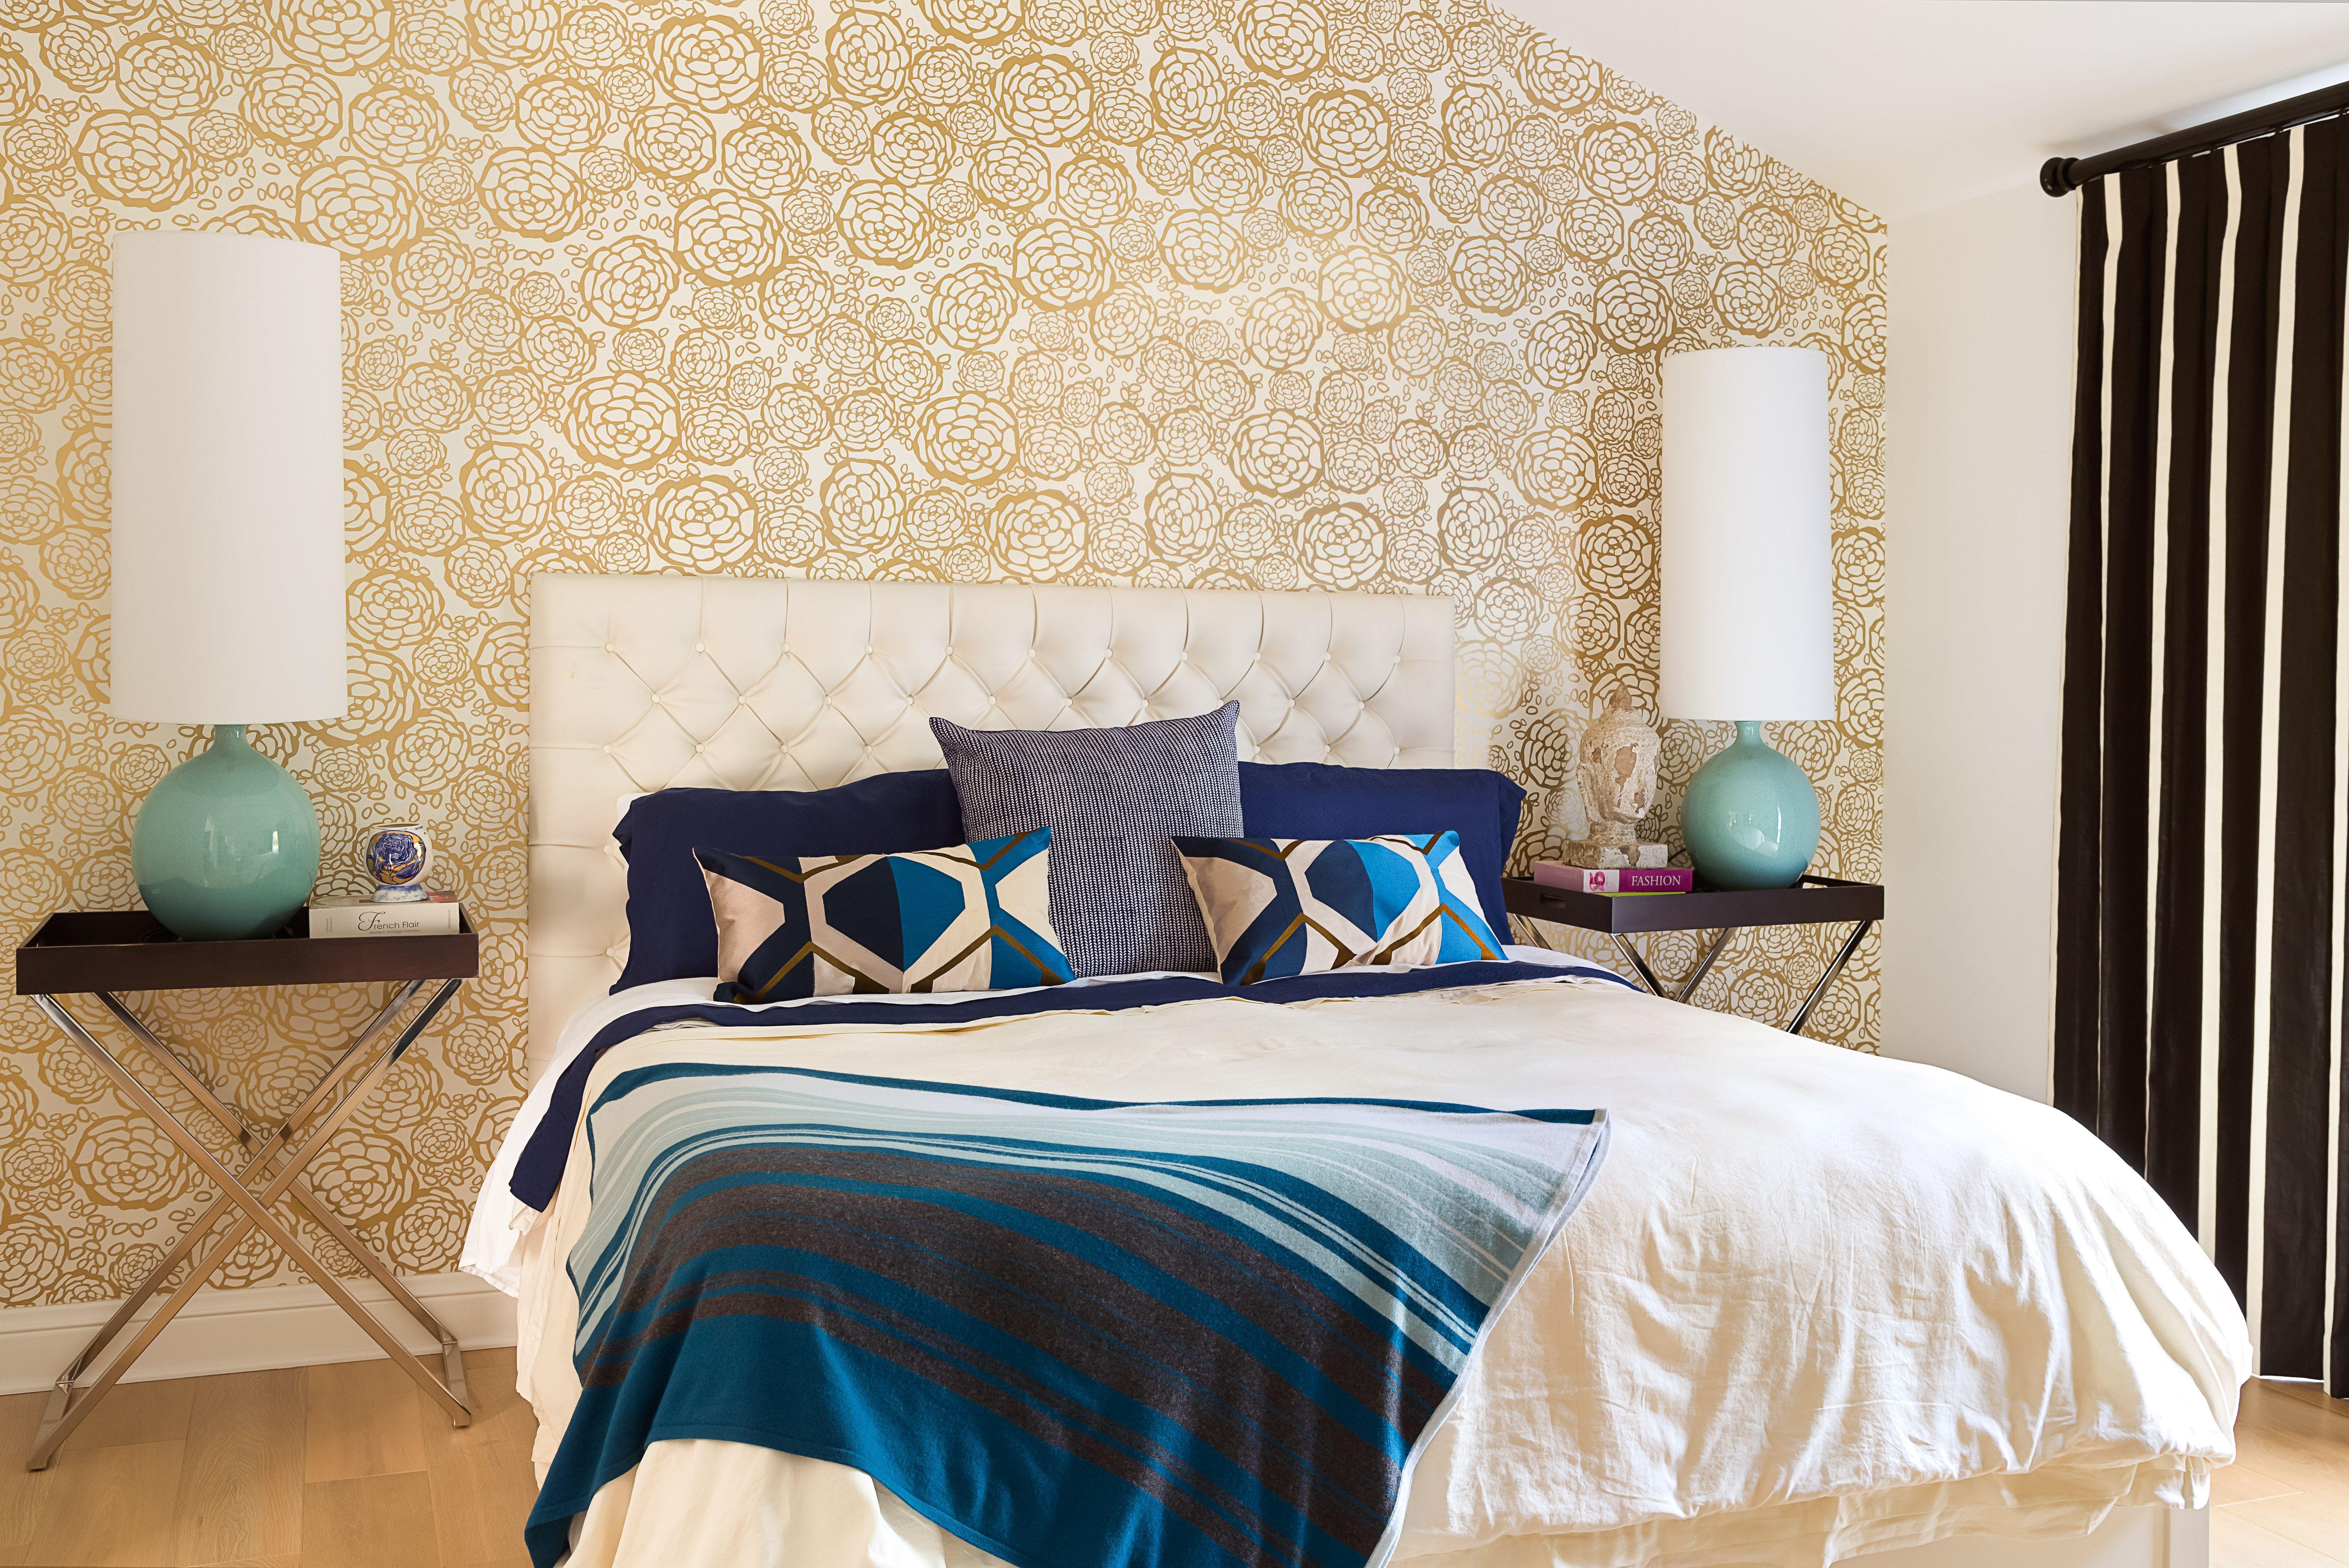 Hygge + West Petal Pusher in Hilltop House master bedroom